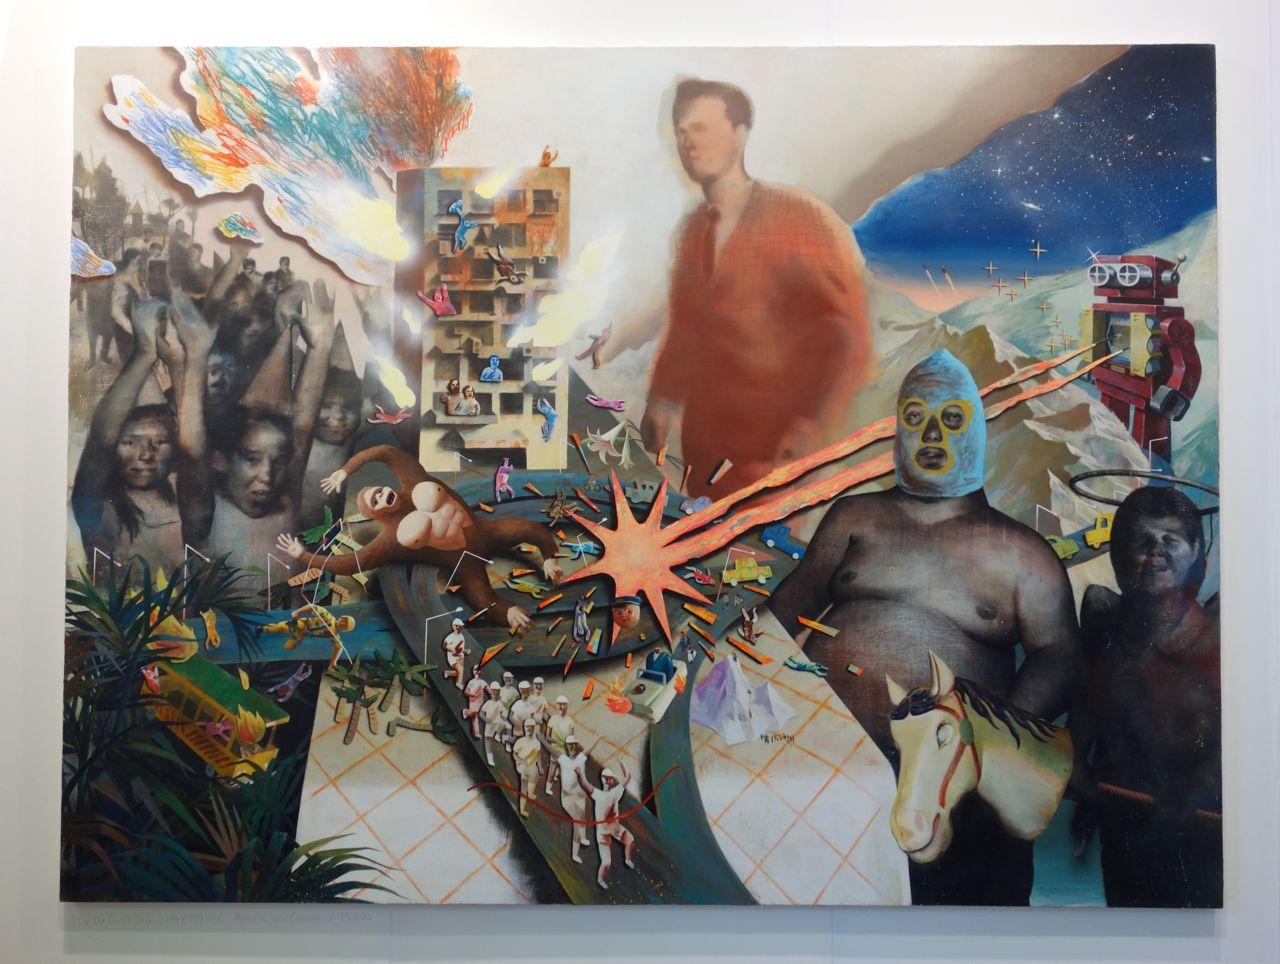 Lai Wei-Yu, 'It's the Final Boss!', 2015, Acrylic on canvas, 194 x 259 cm, Yiri Arts (Taiwan)